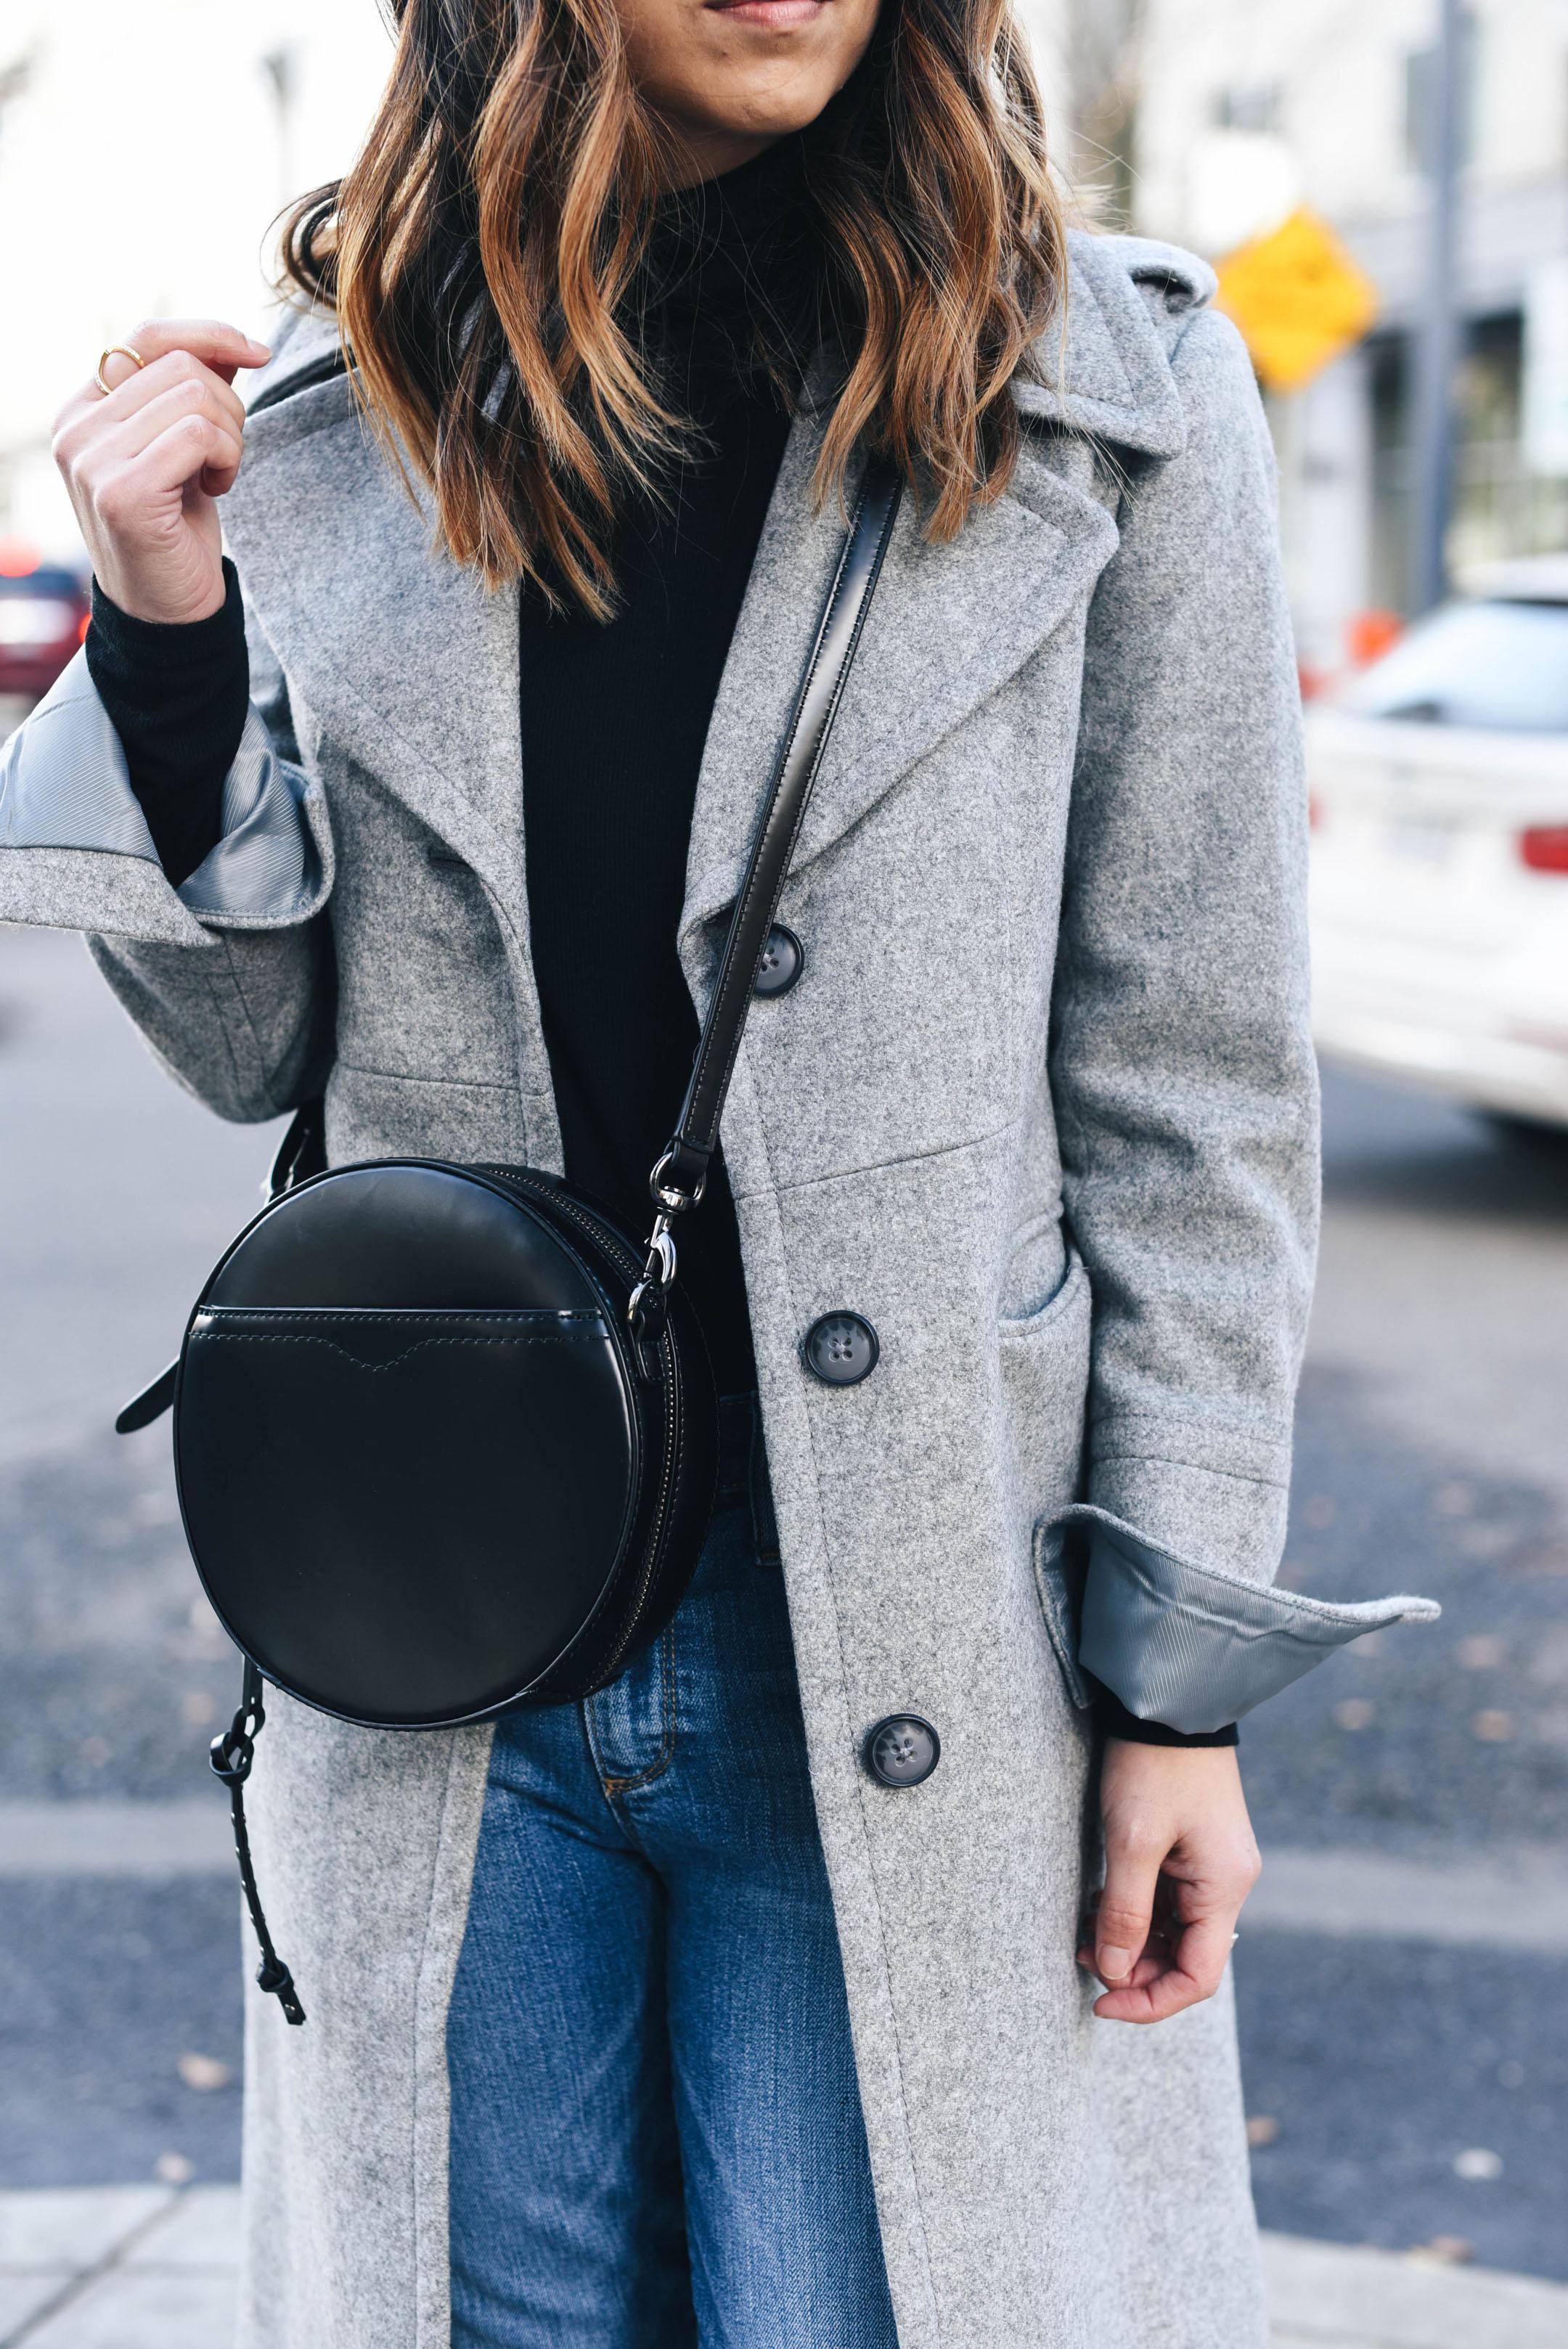 banana-republic-melton-wool-gray-coat